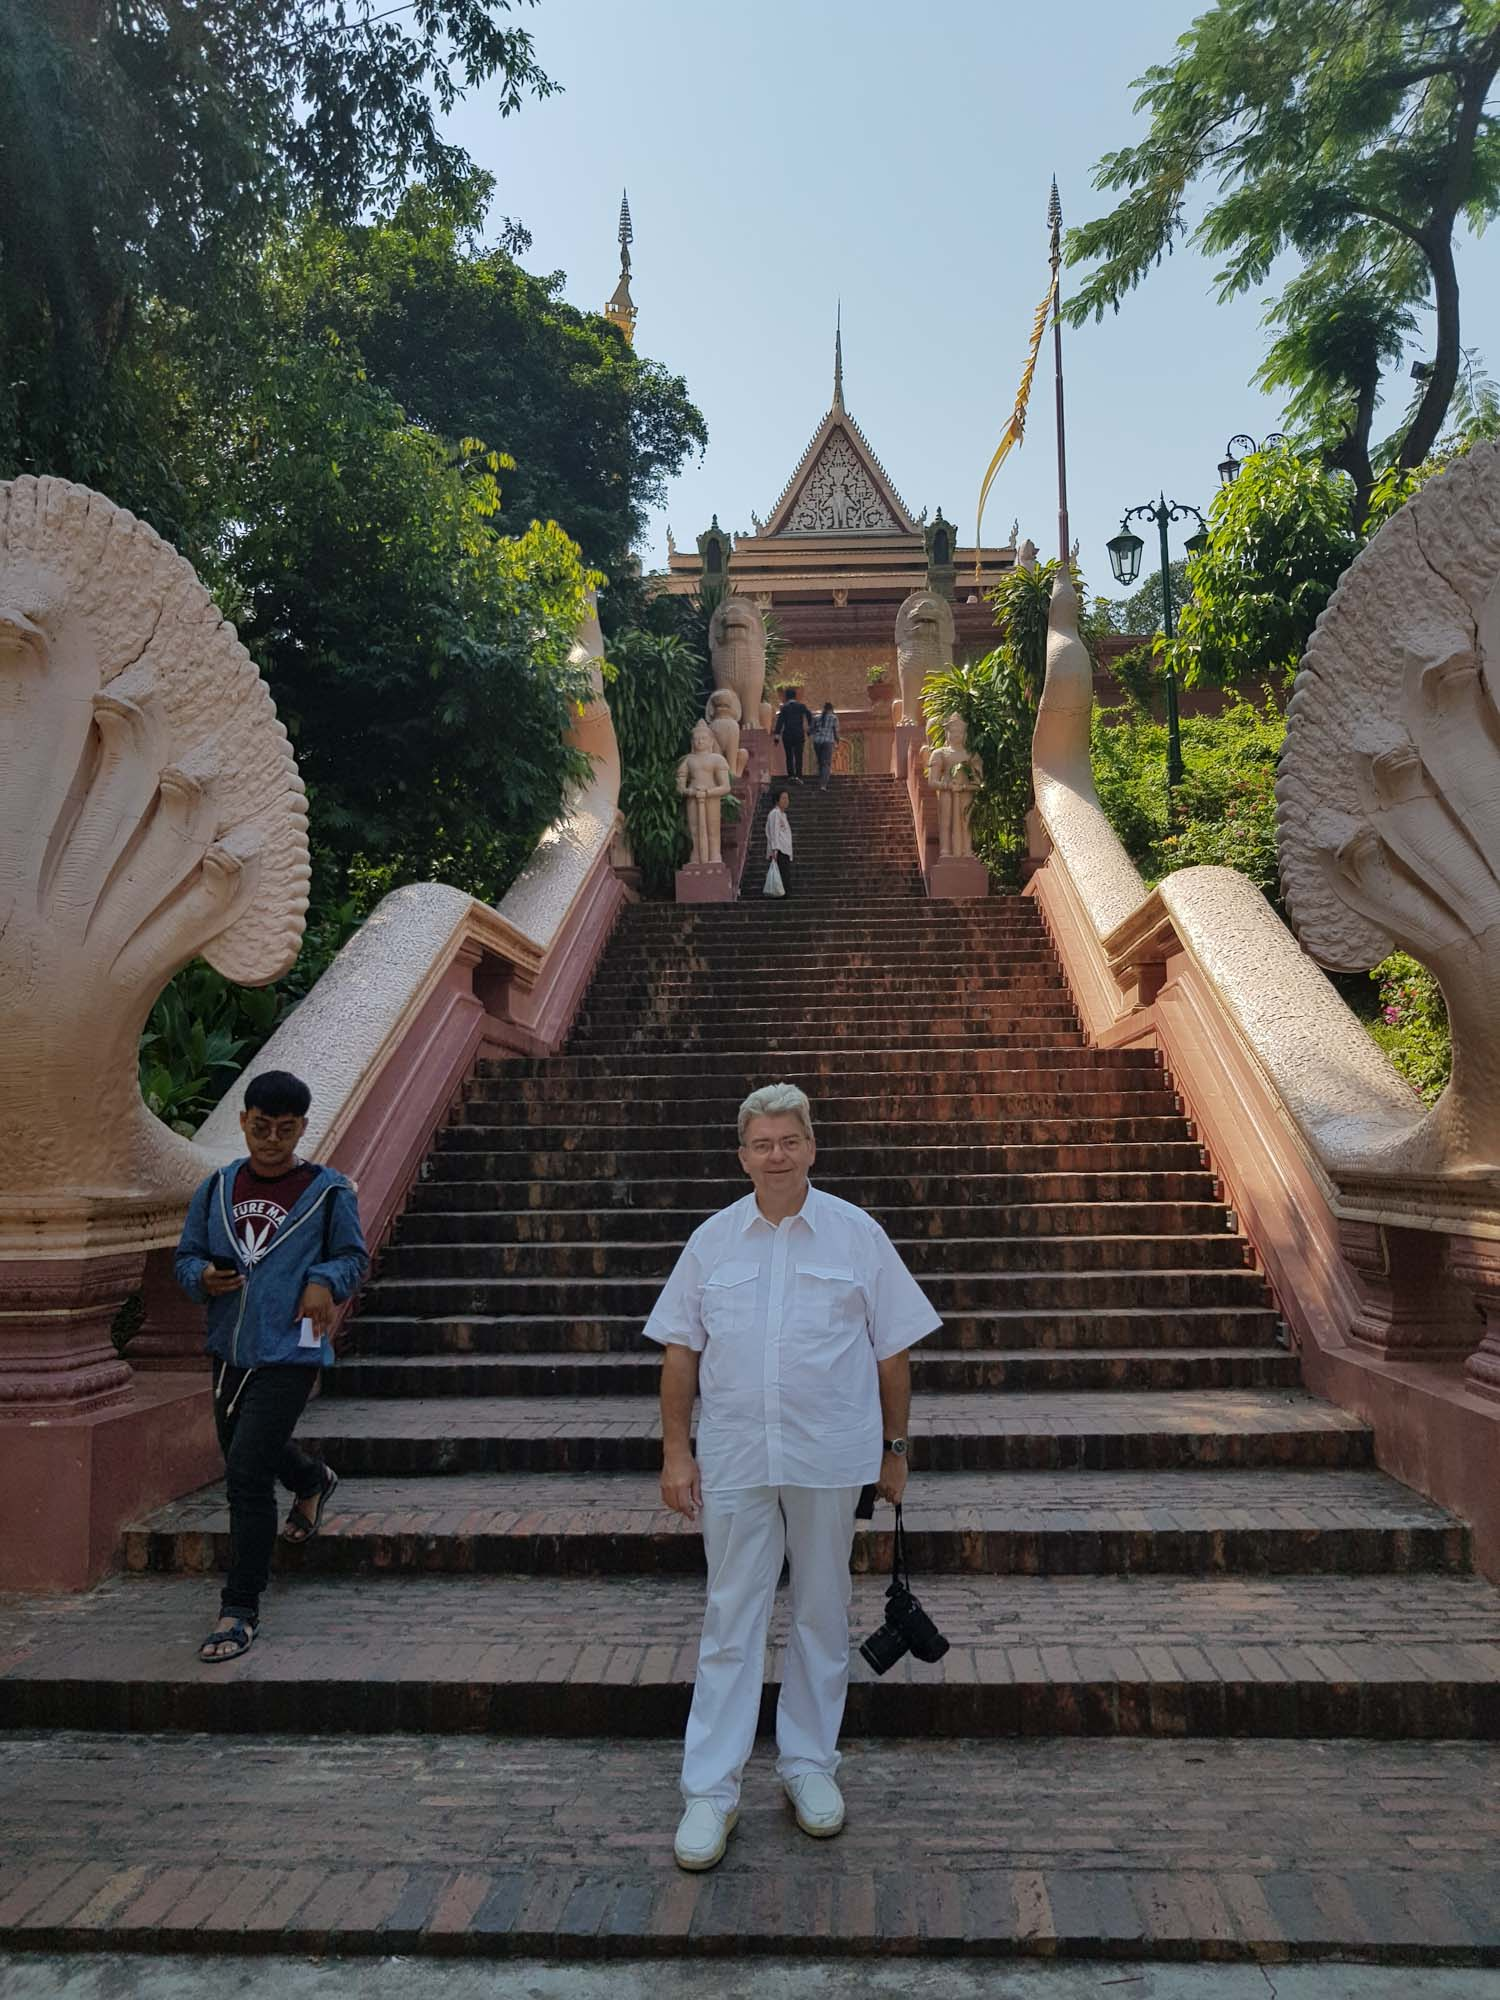 Peter Jurgilewitsch vor dem Wat Phnom in Phom Penh, Kambodscha